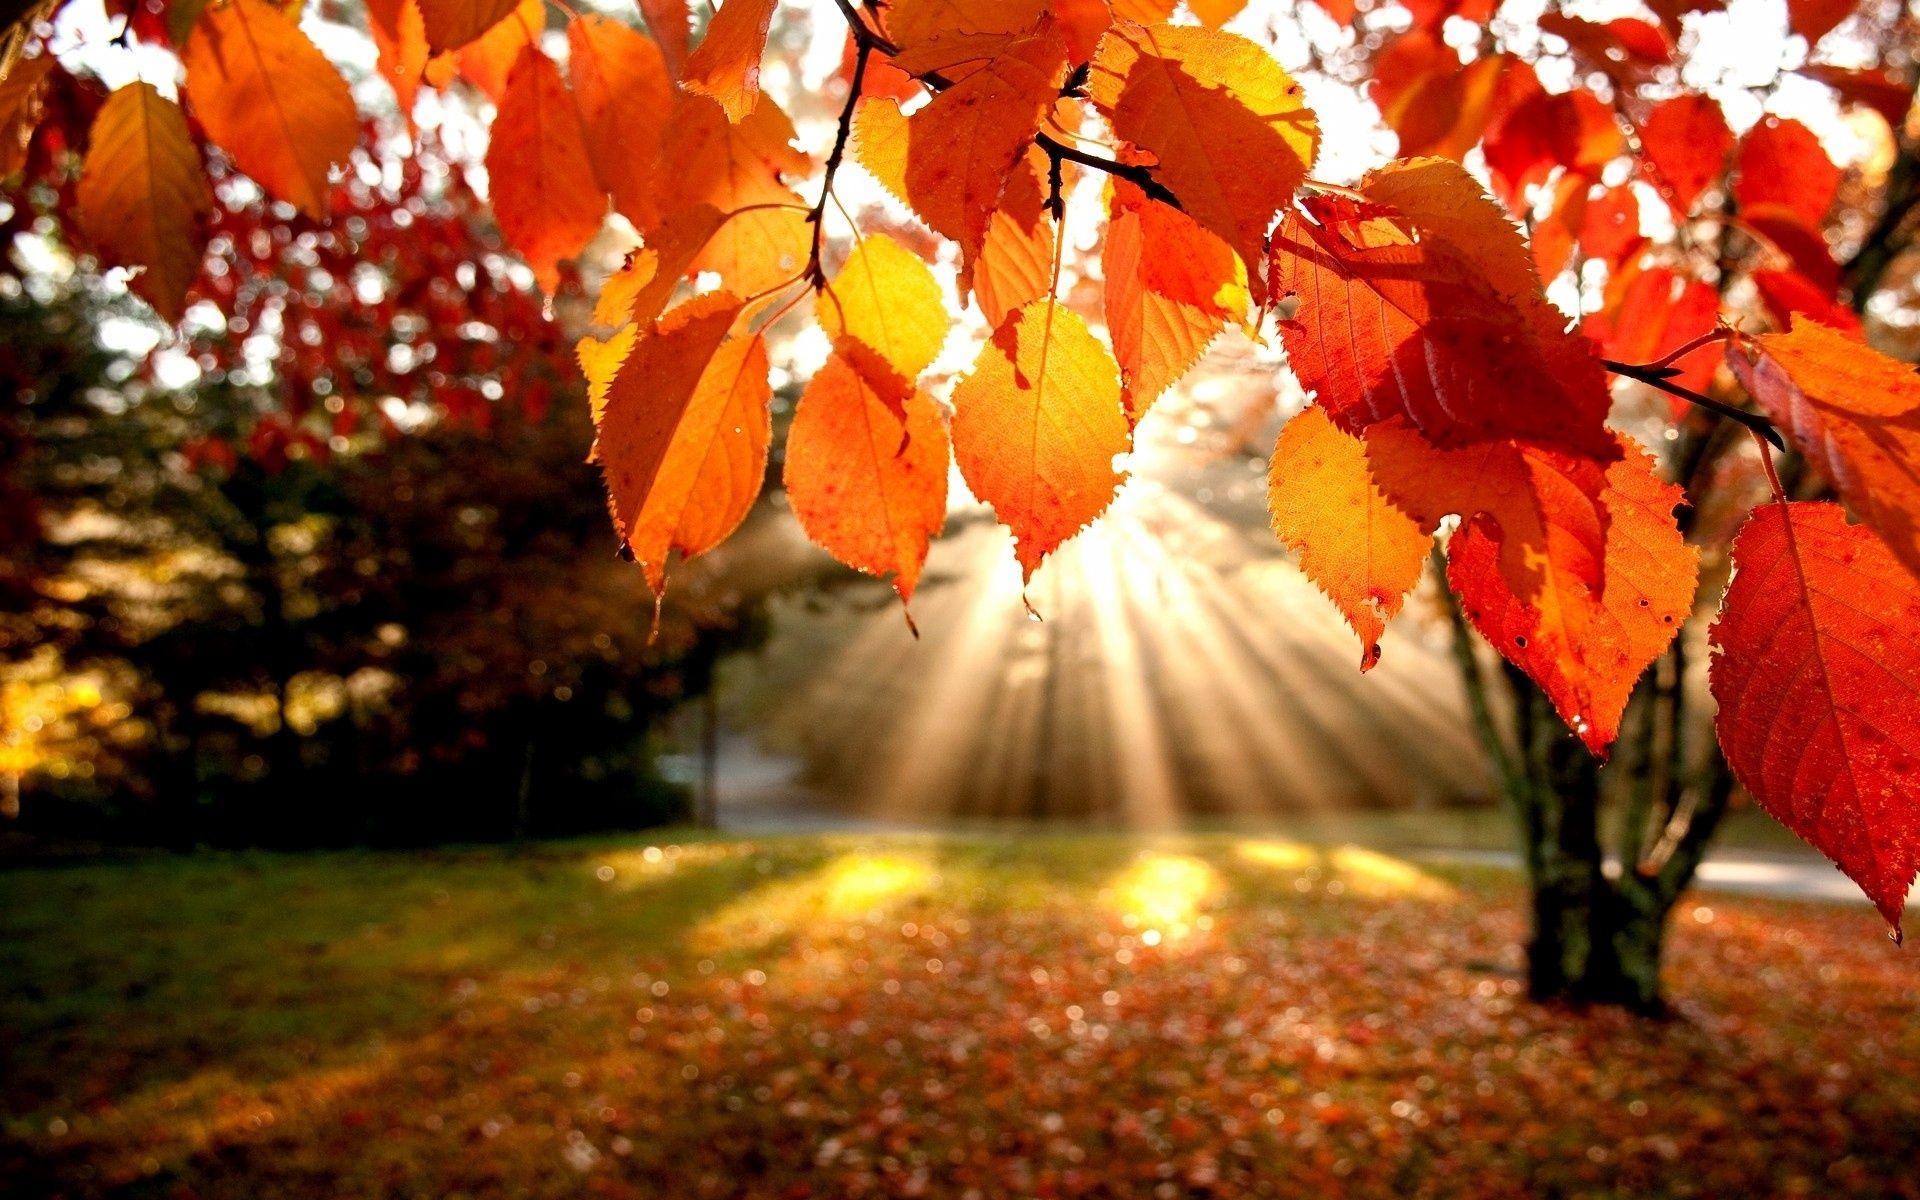 Beautiful Autumn Trees Viewing Gallery Autumn Leaves Wallpaper Autumn Trees Autumn Scenery